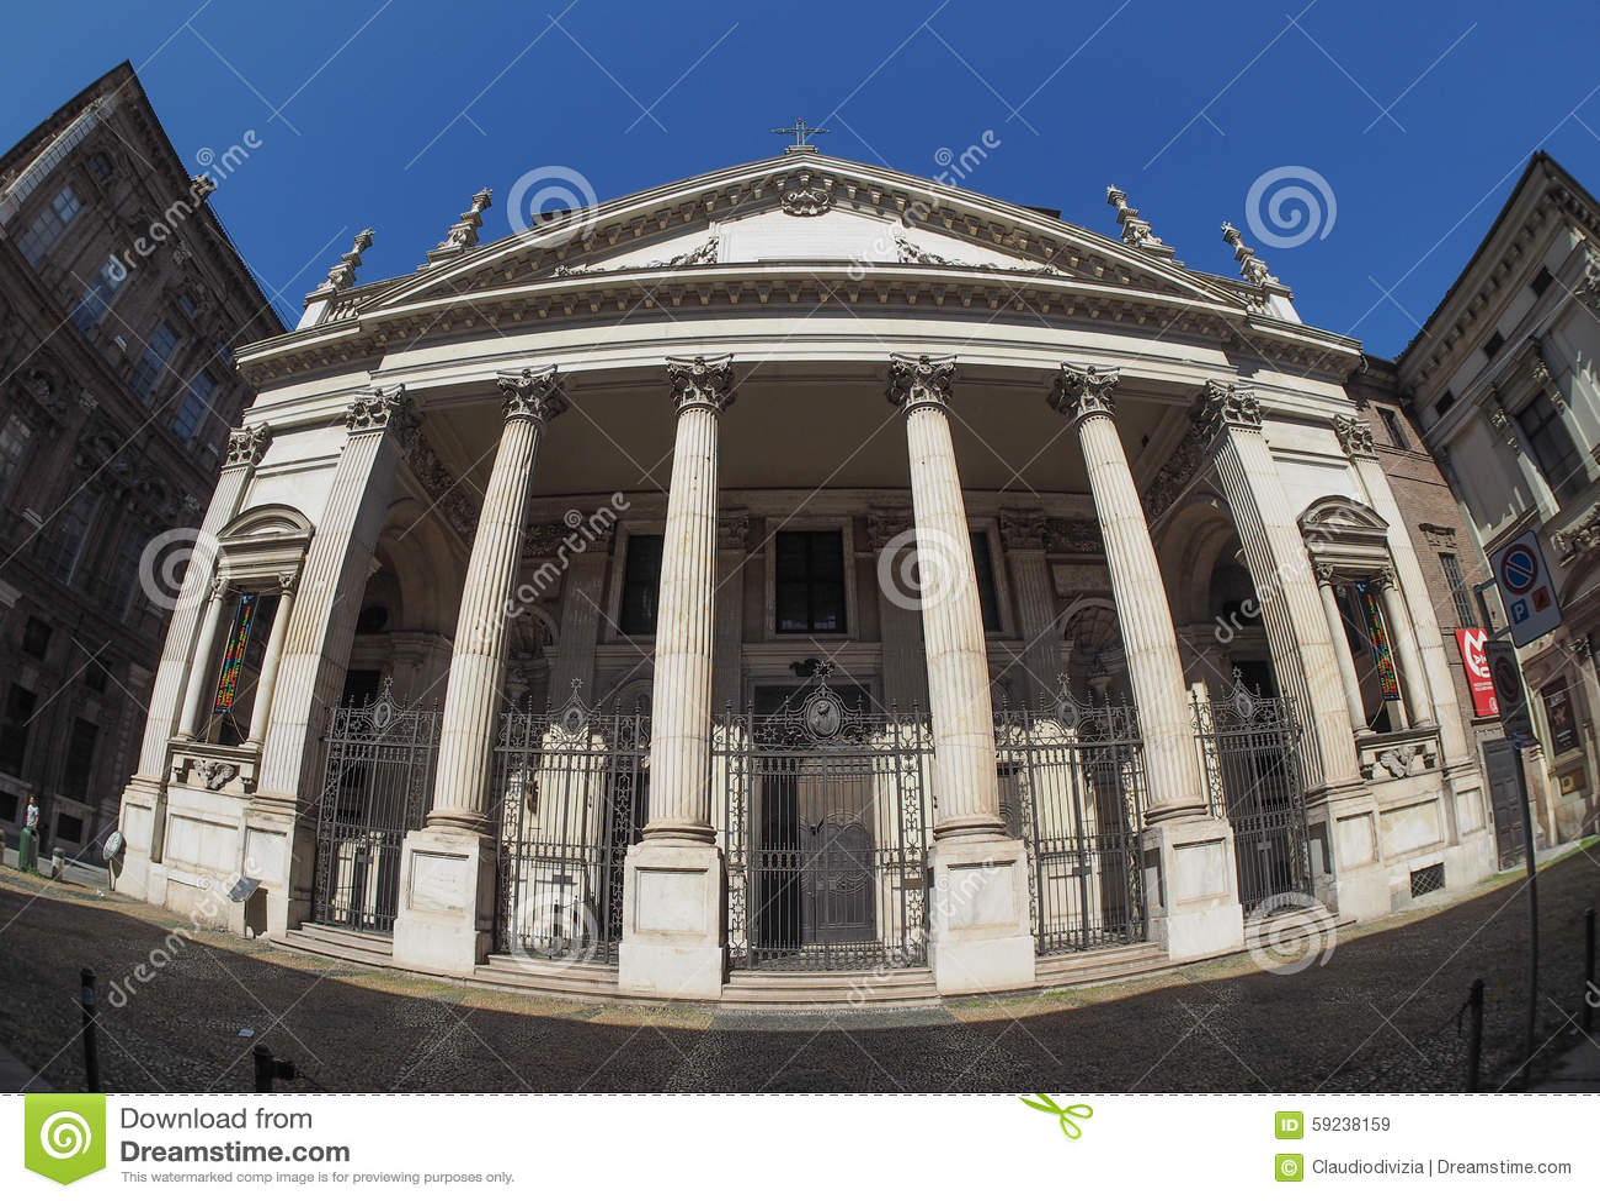 Download Iglesia De San Filippo Neri En Turín Imagen de archivo - Imagen de cityscape, europa: 59238159